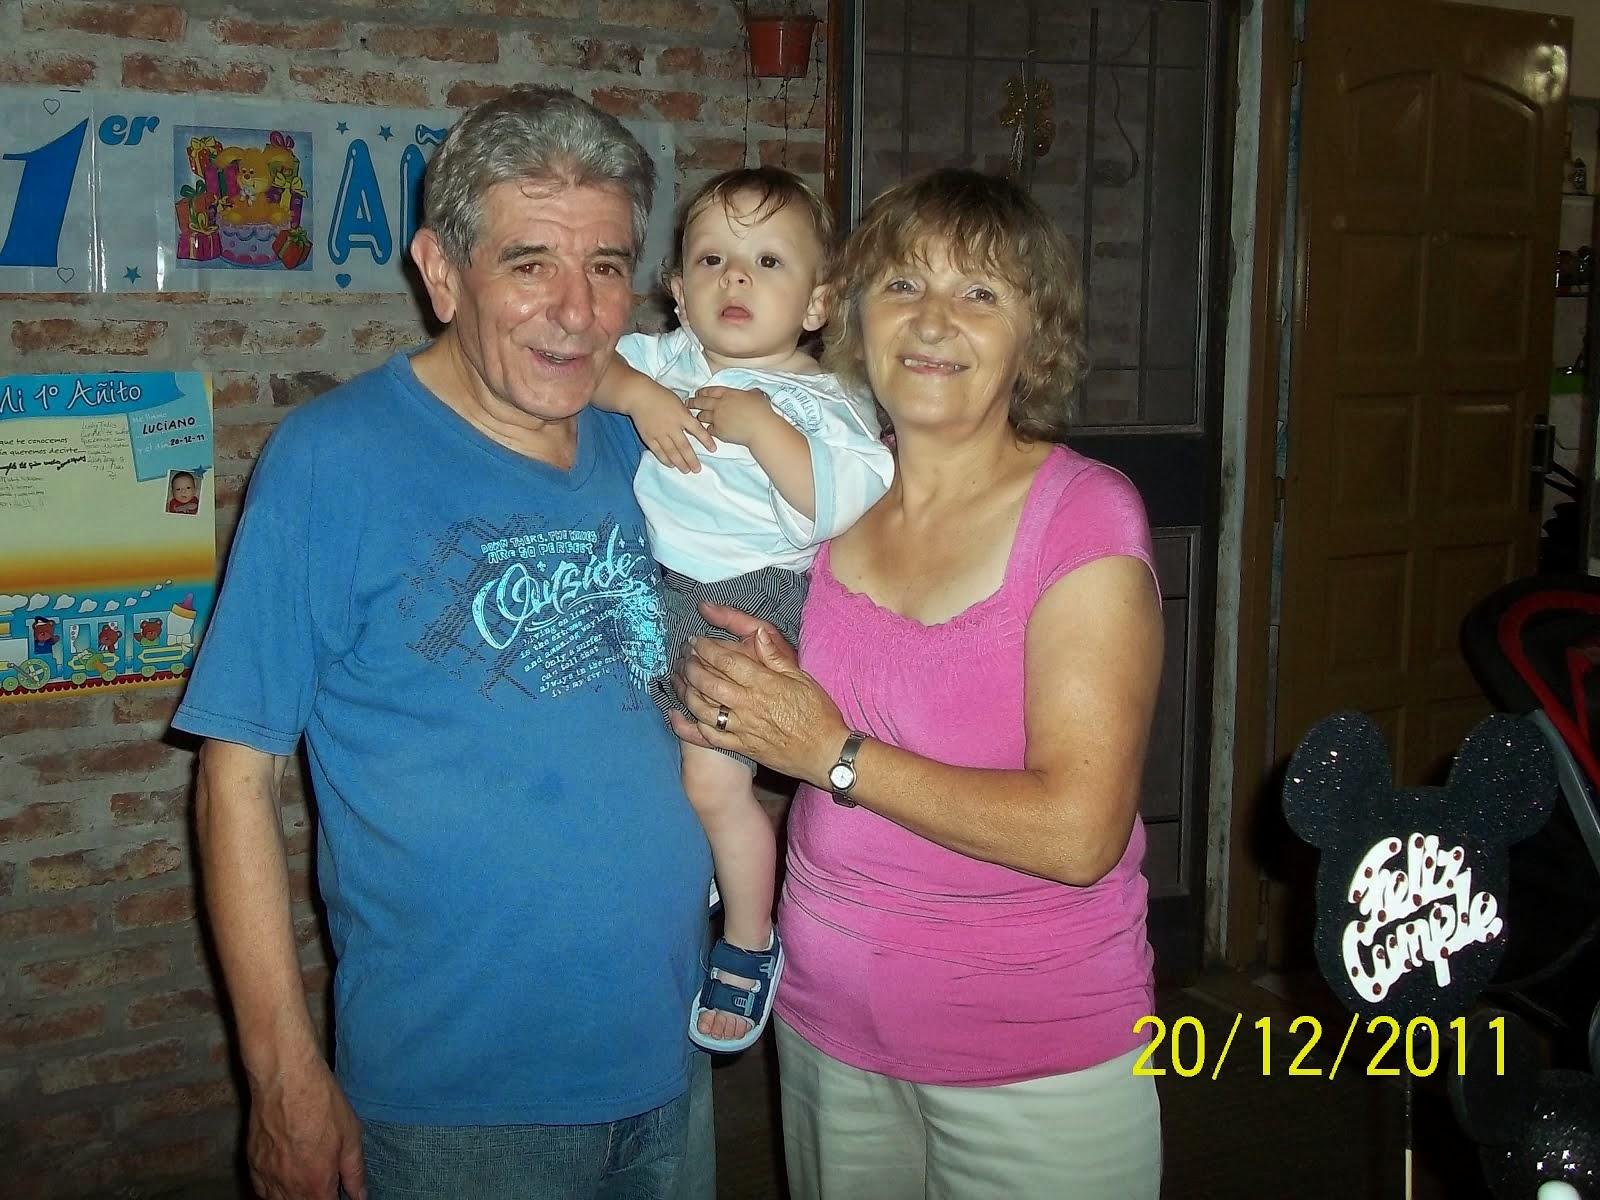 Fotos con mi familia